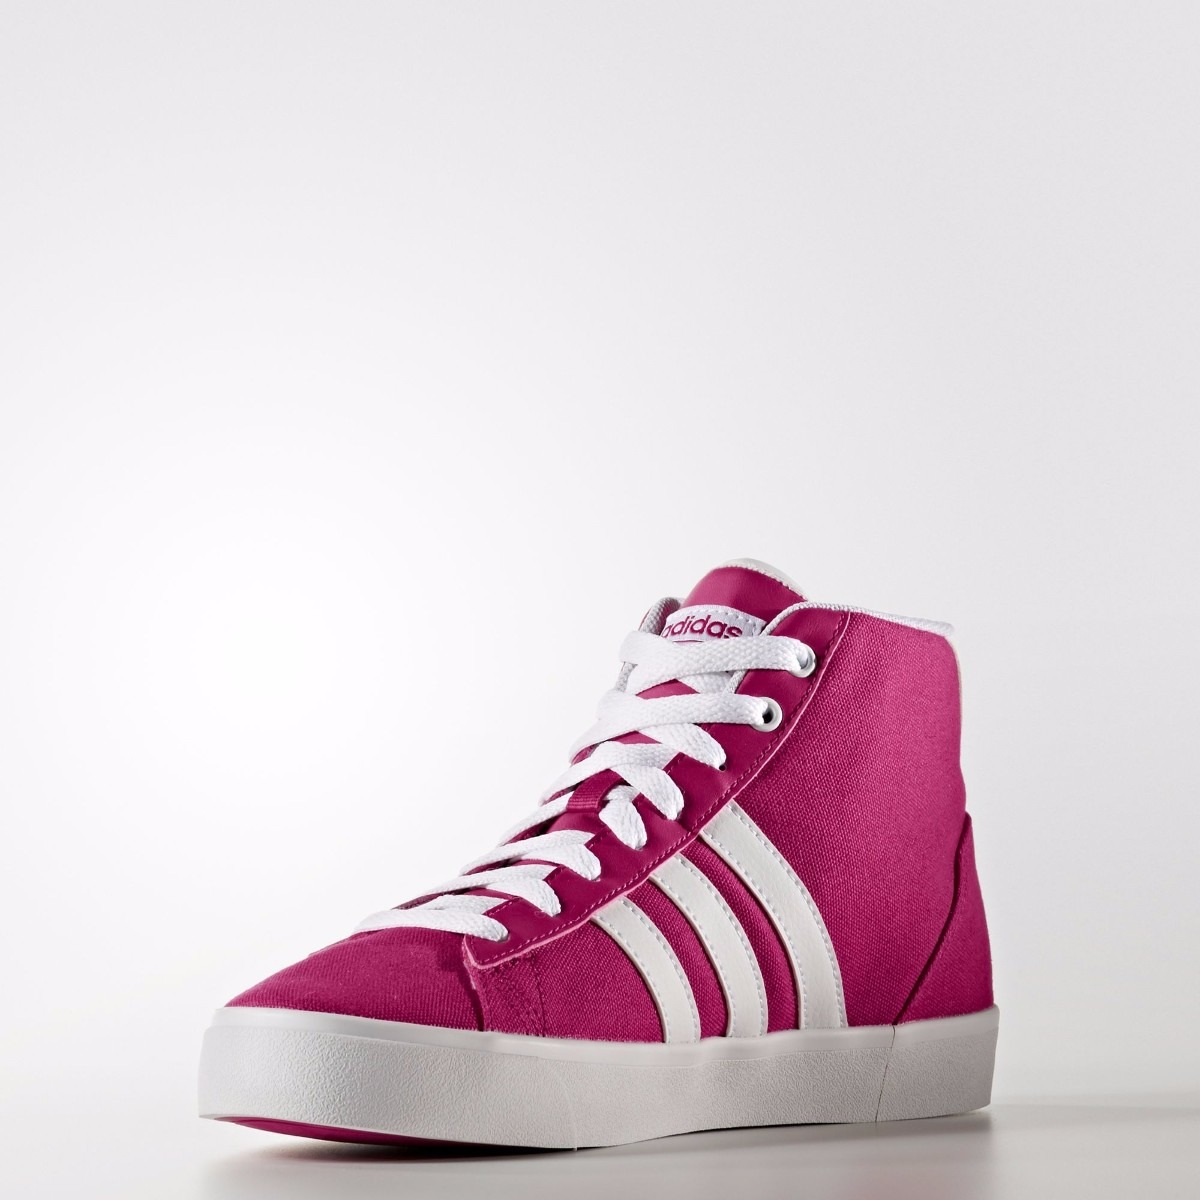 Adidas Neo Cloudfoam | Billig Adidas Neo Cloudfoam Daily Qt